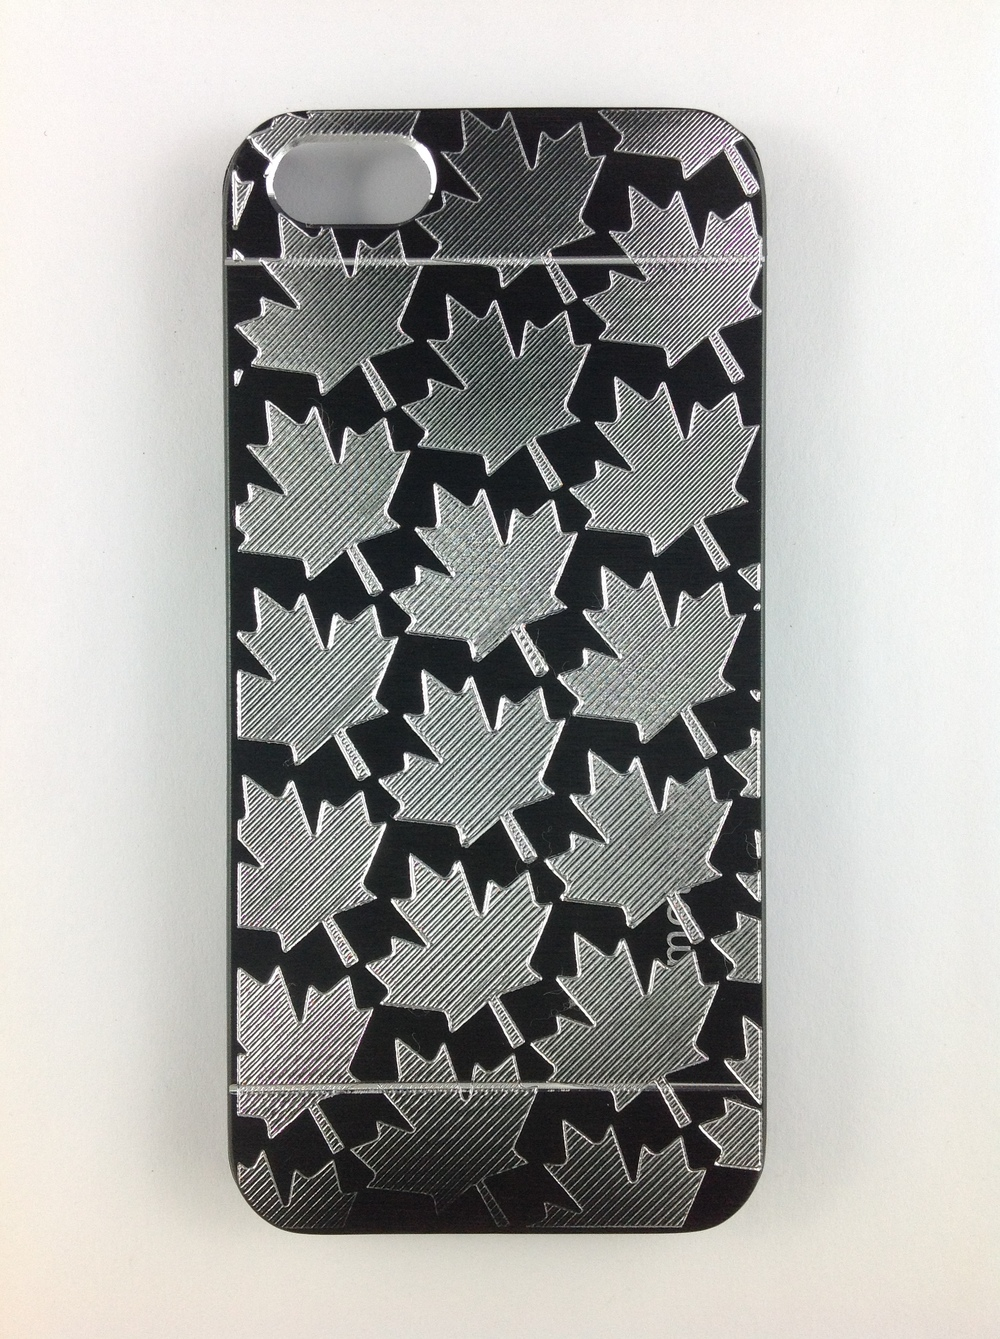 DigitalCarver-iPhone5s-IMG_3698.JPG